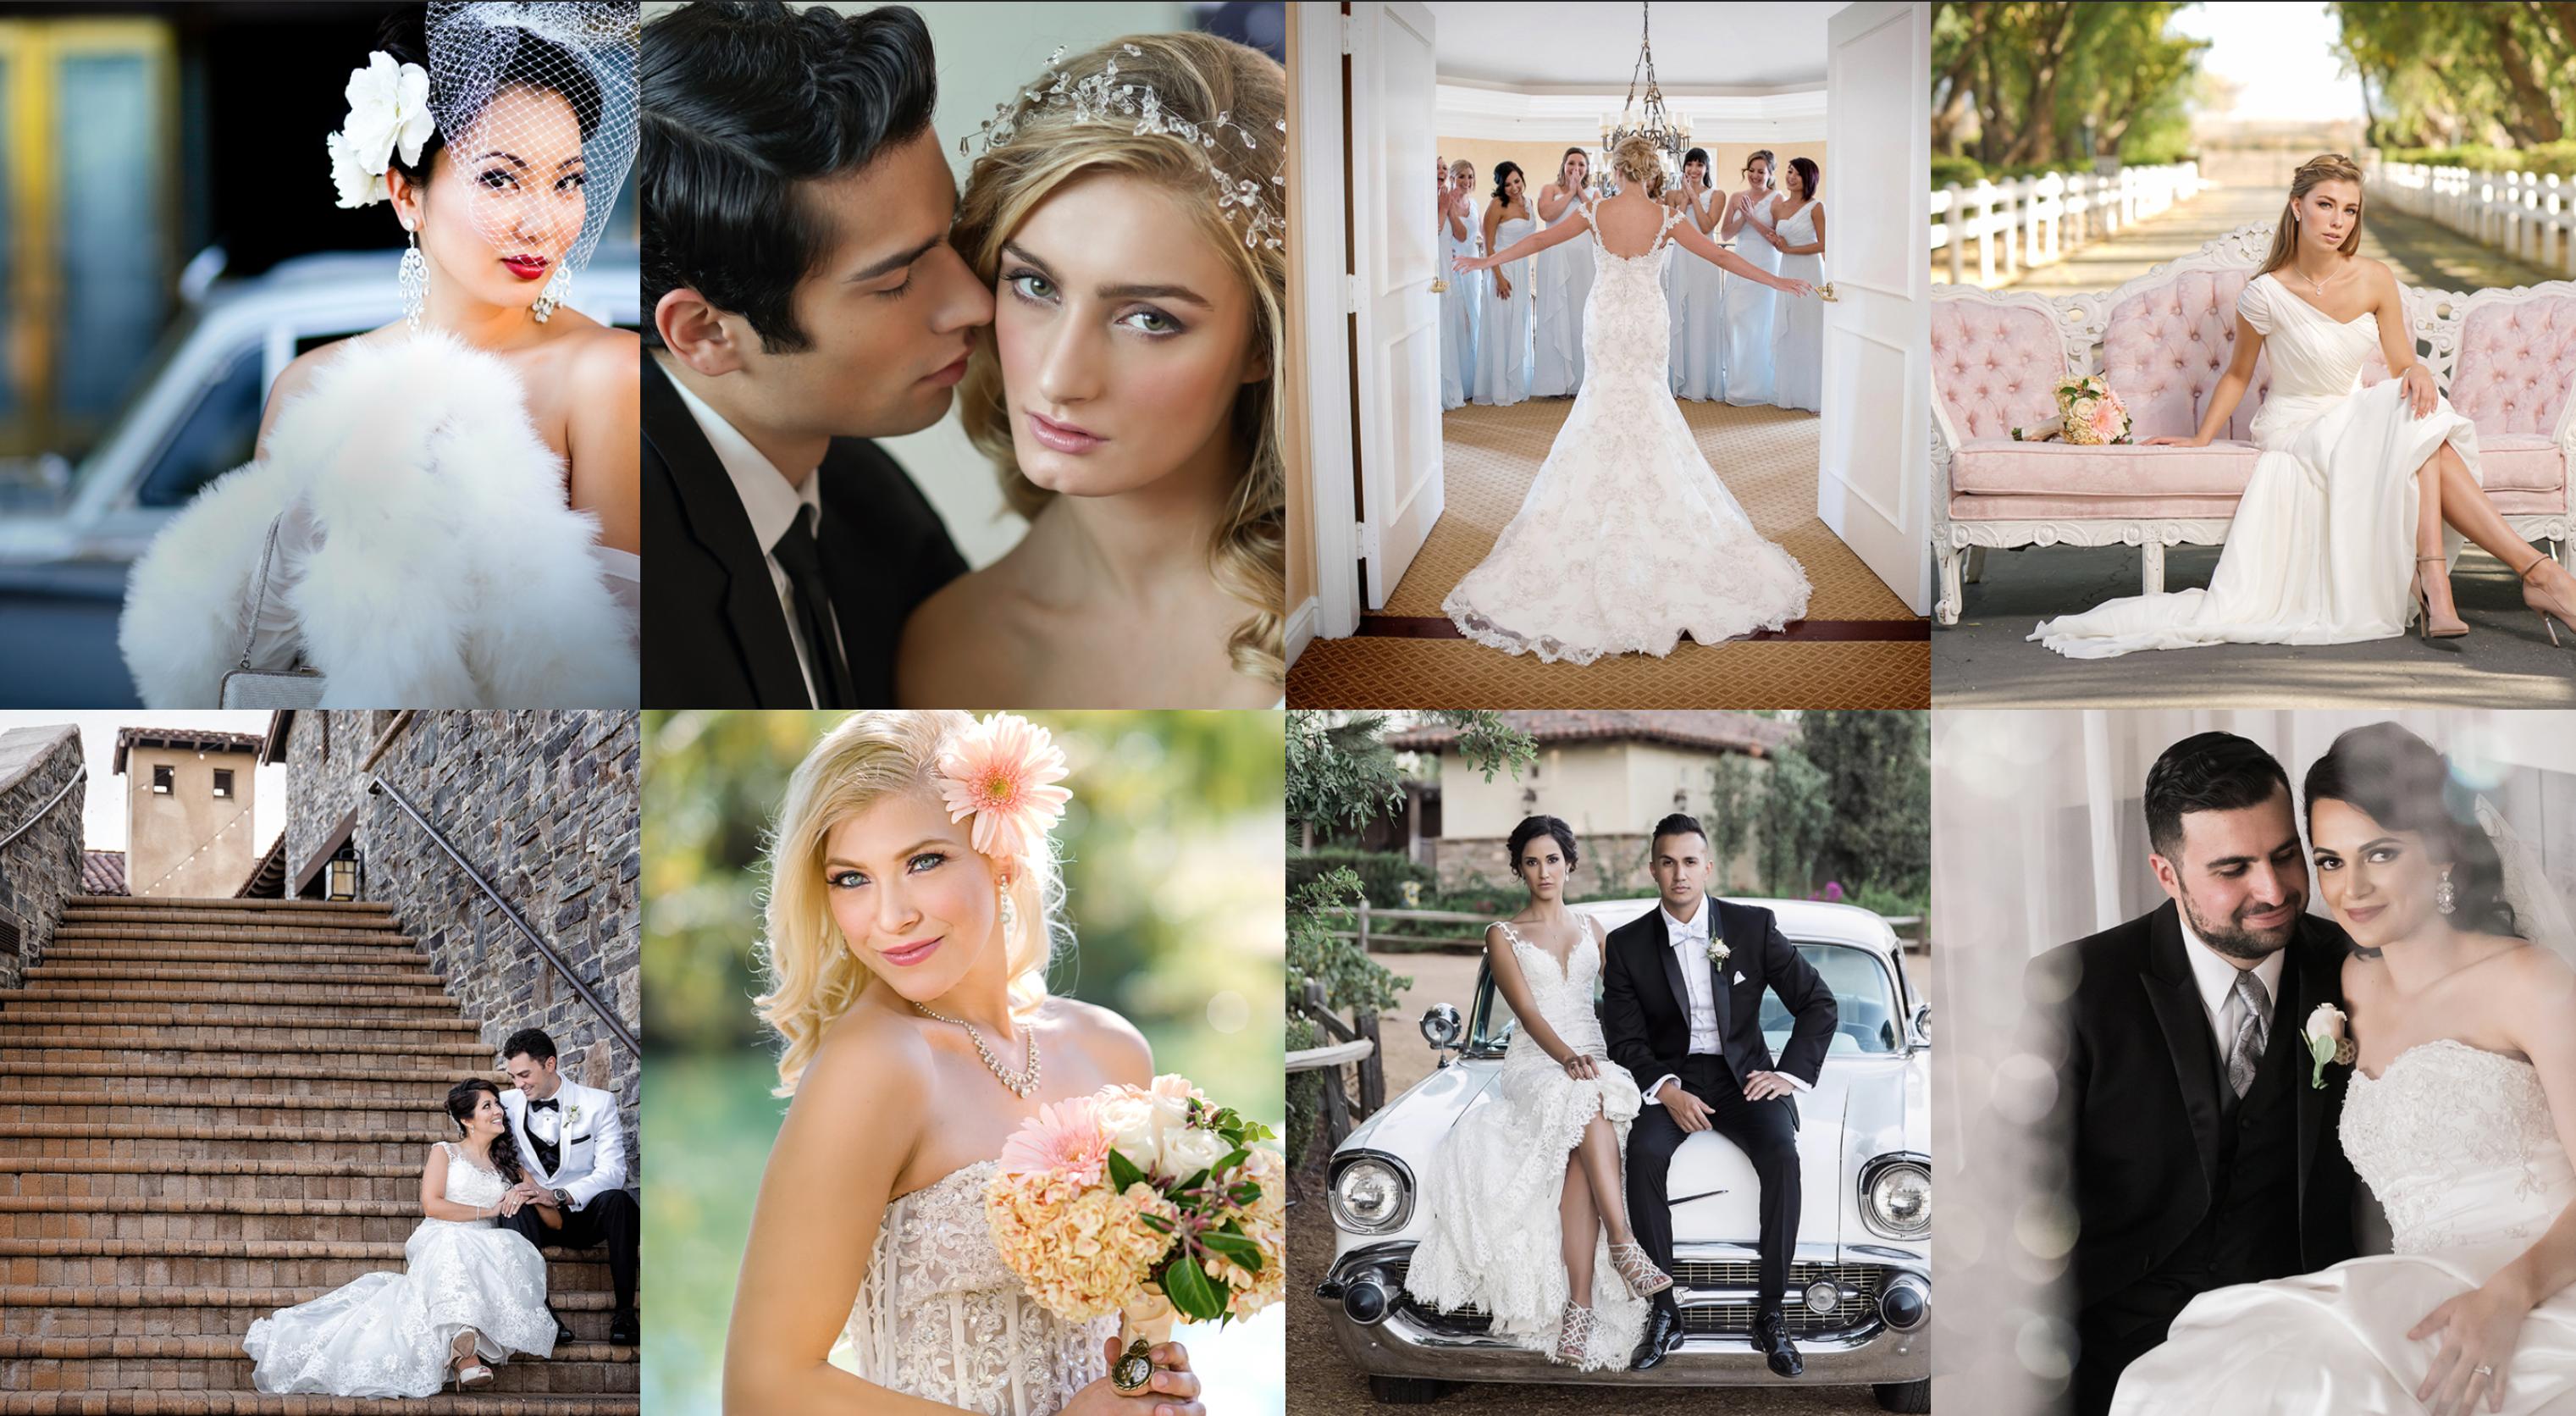 WEDDING PHOTOGRAPHY BOOTCAMP